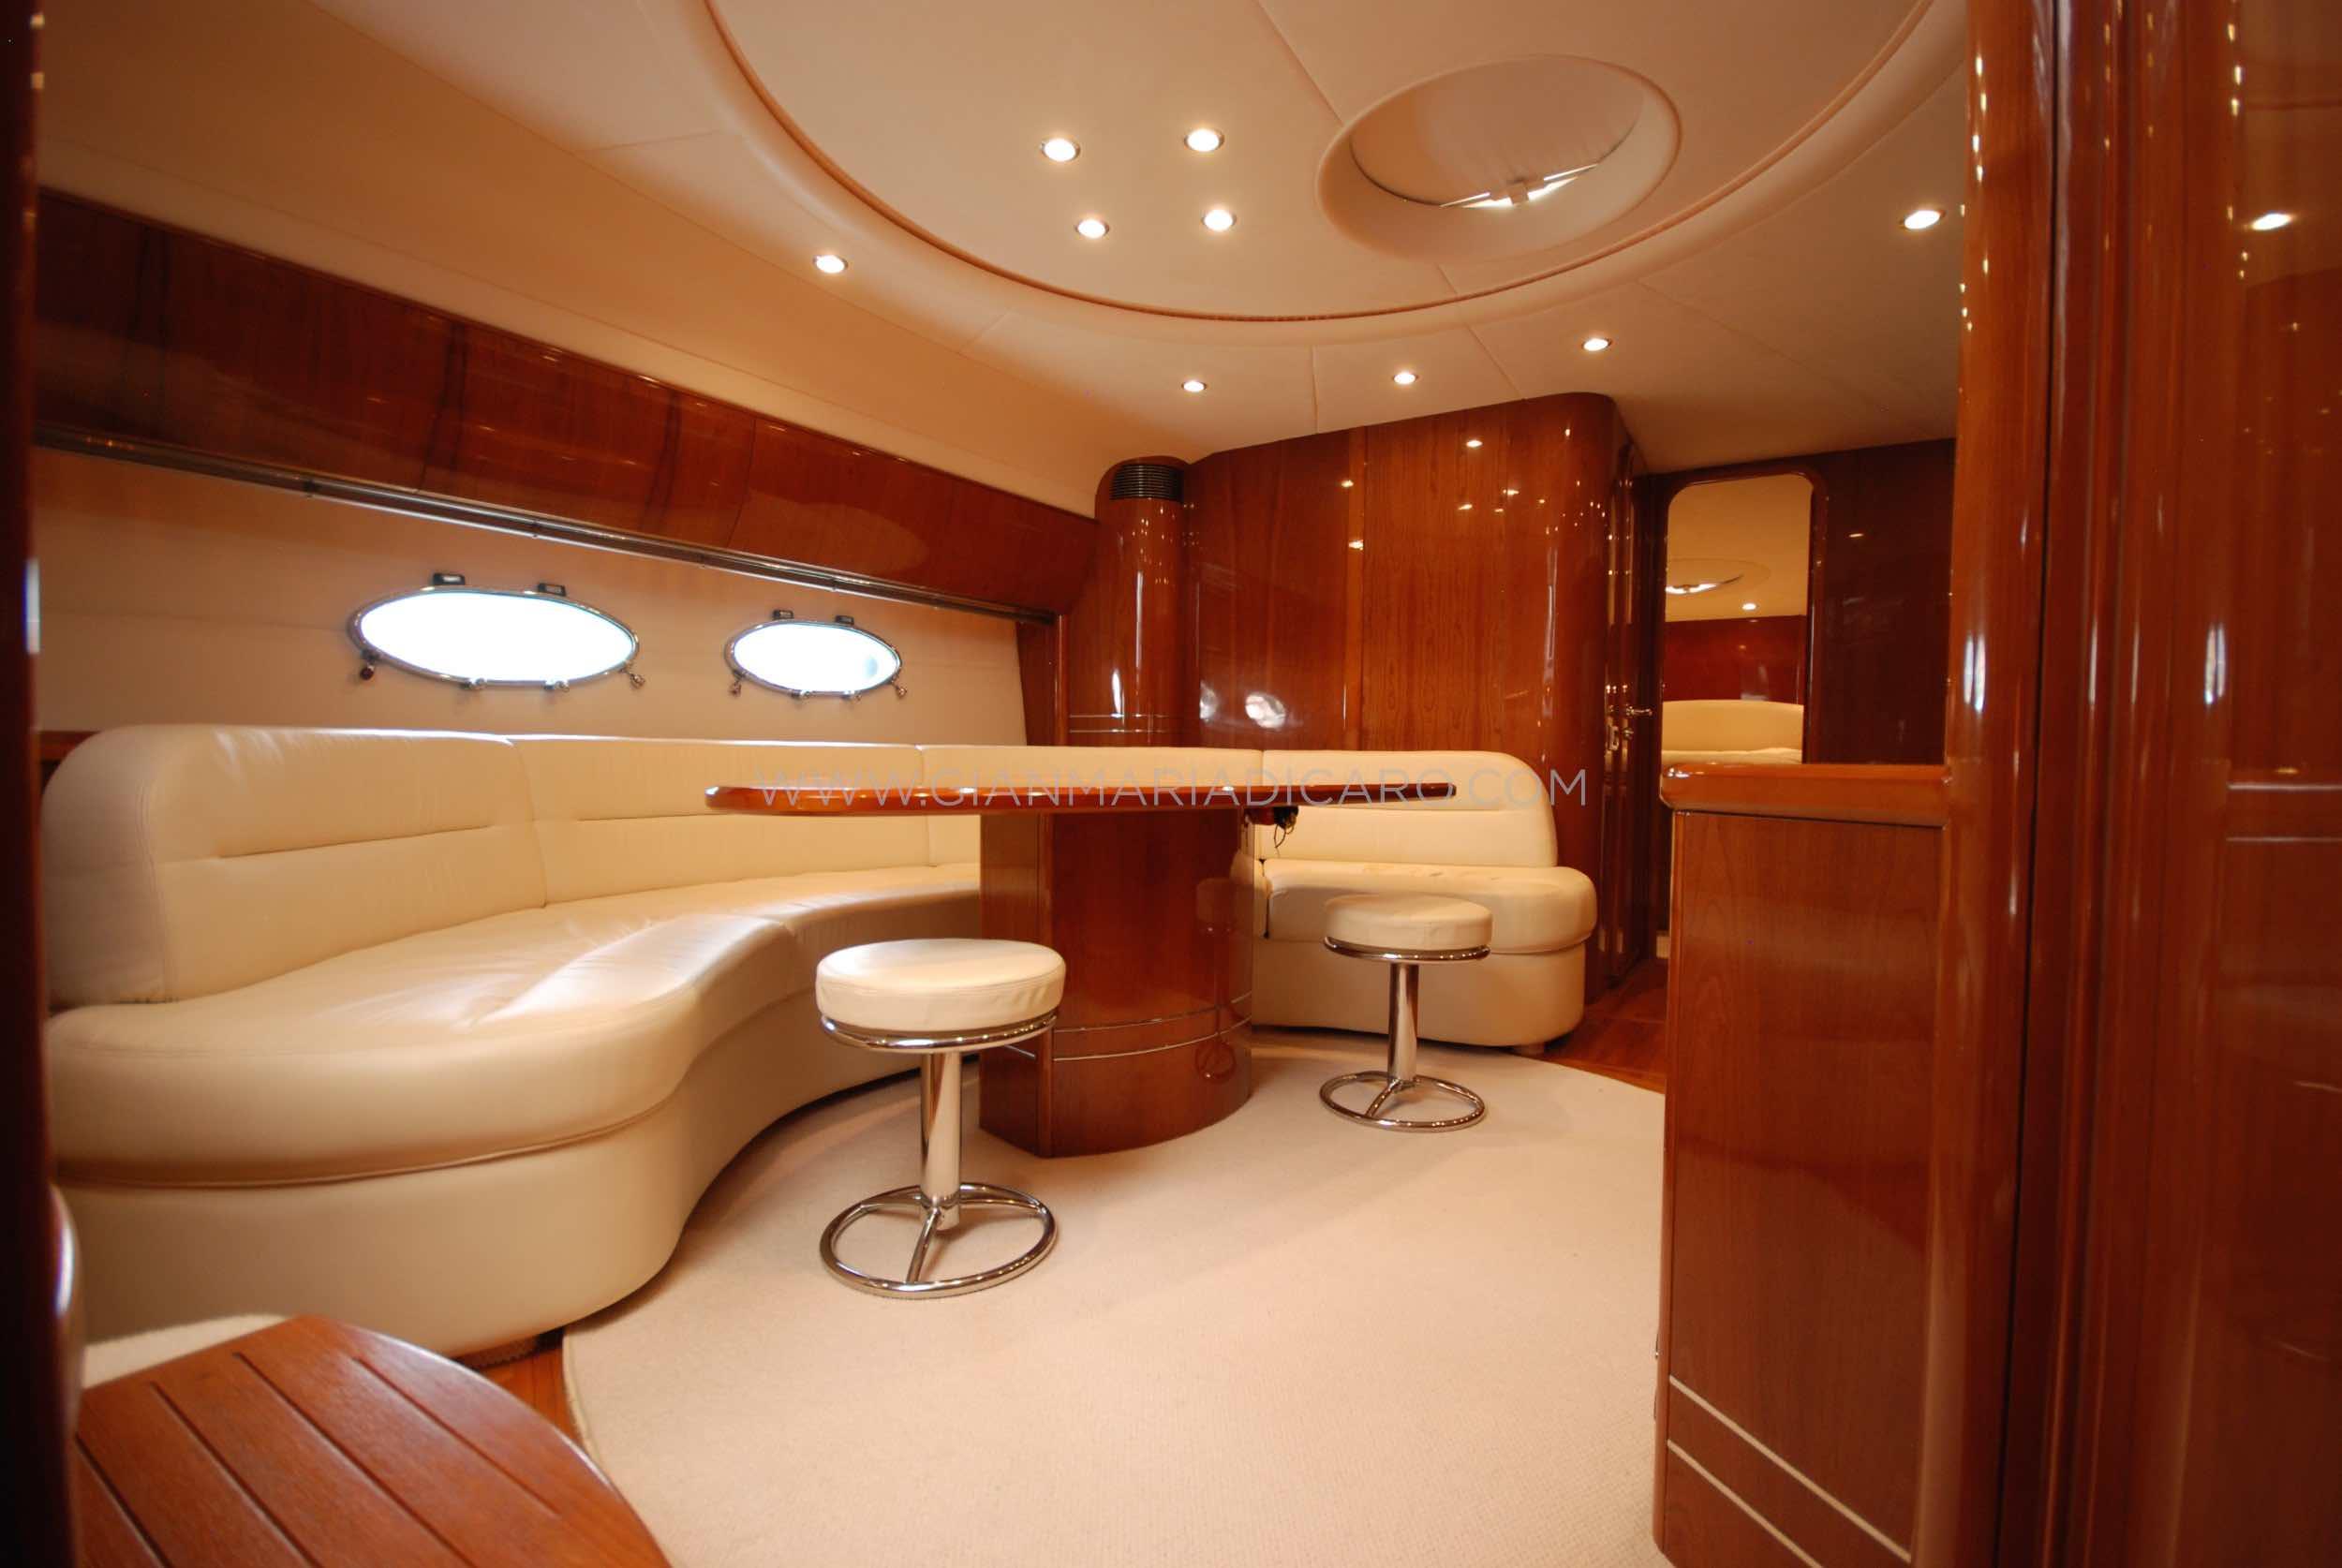 princess-yachts-v58-maestro-di-vita-for-sale-13.jpg